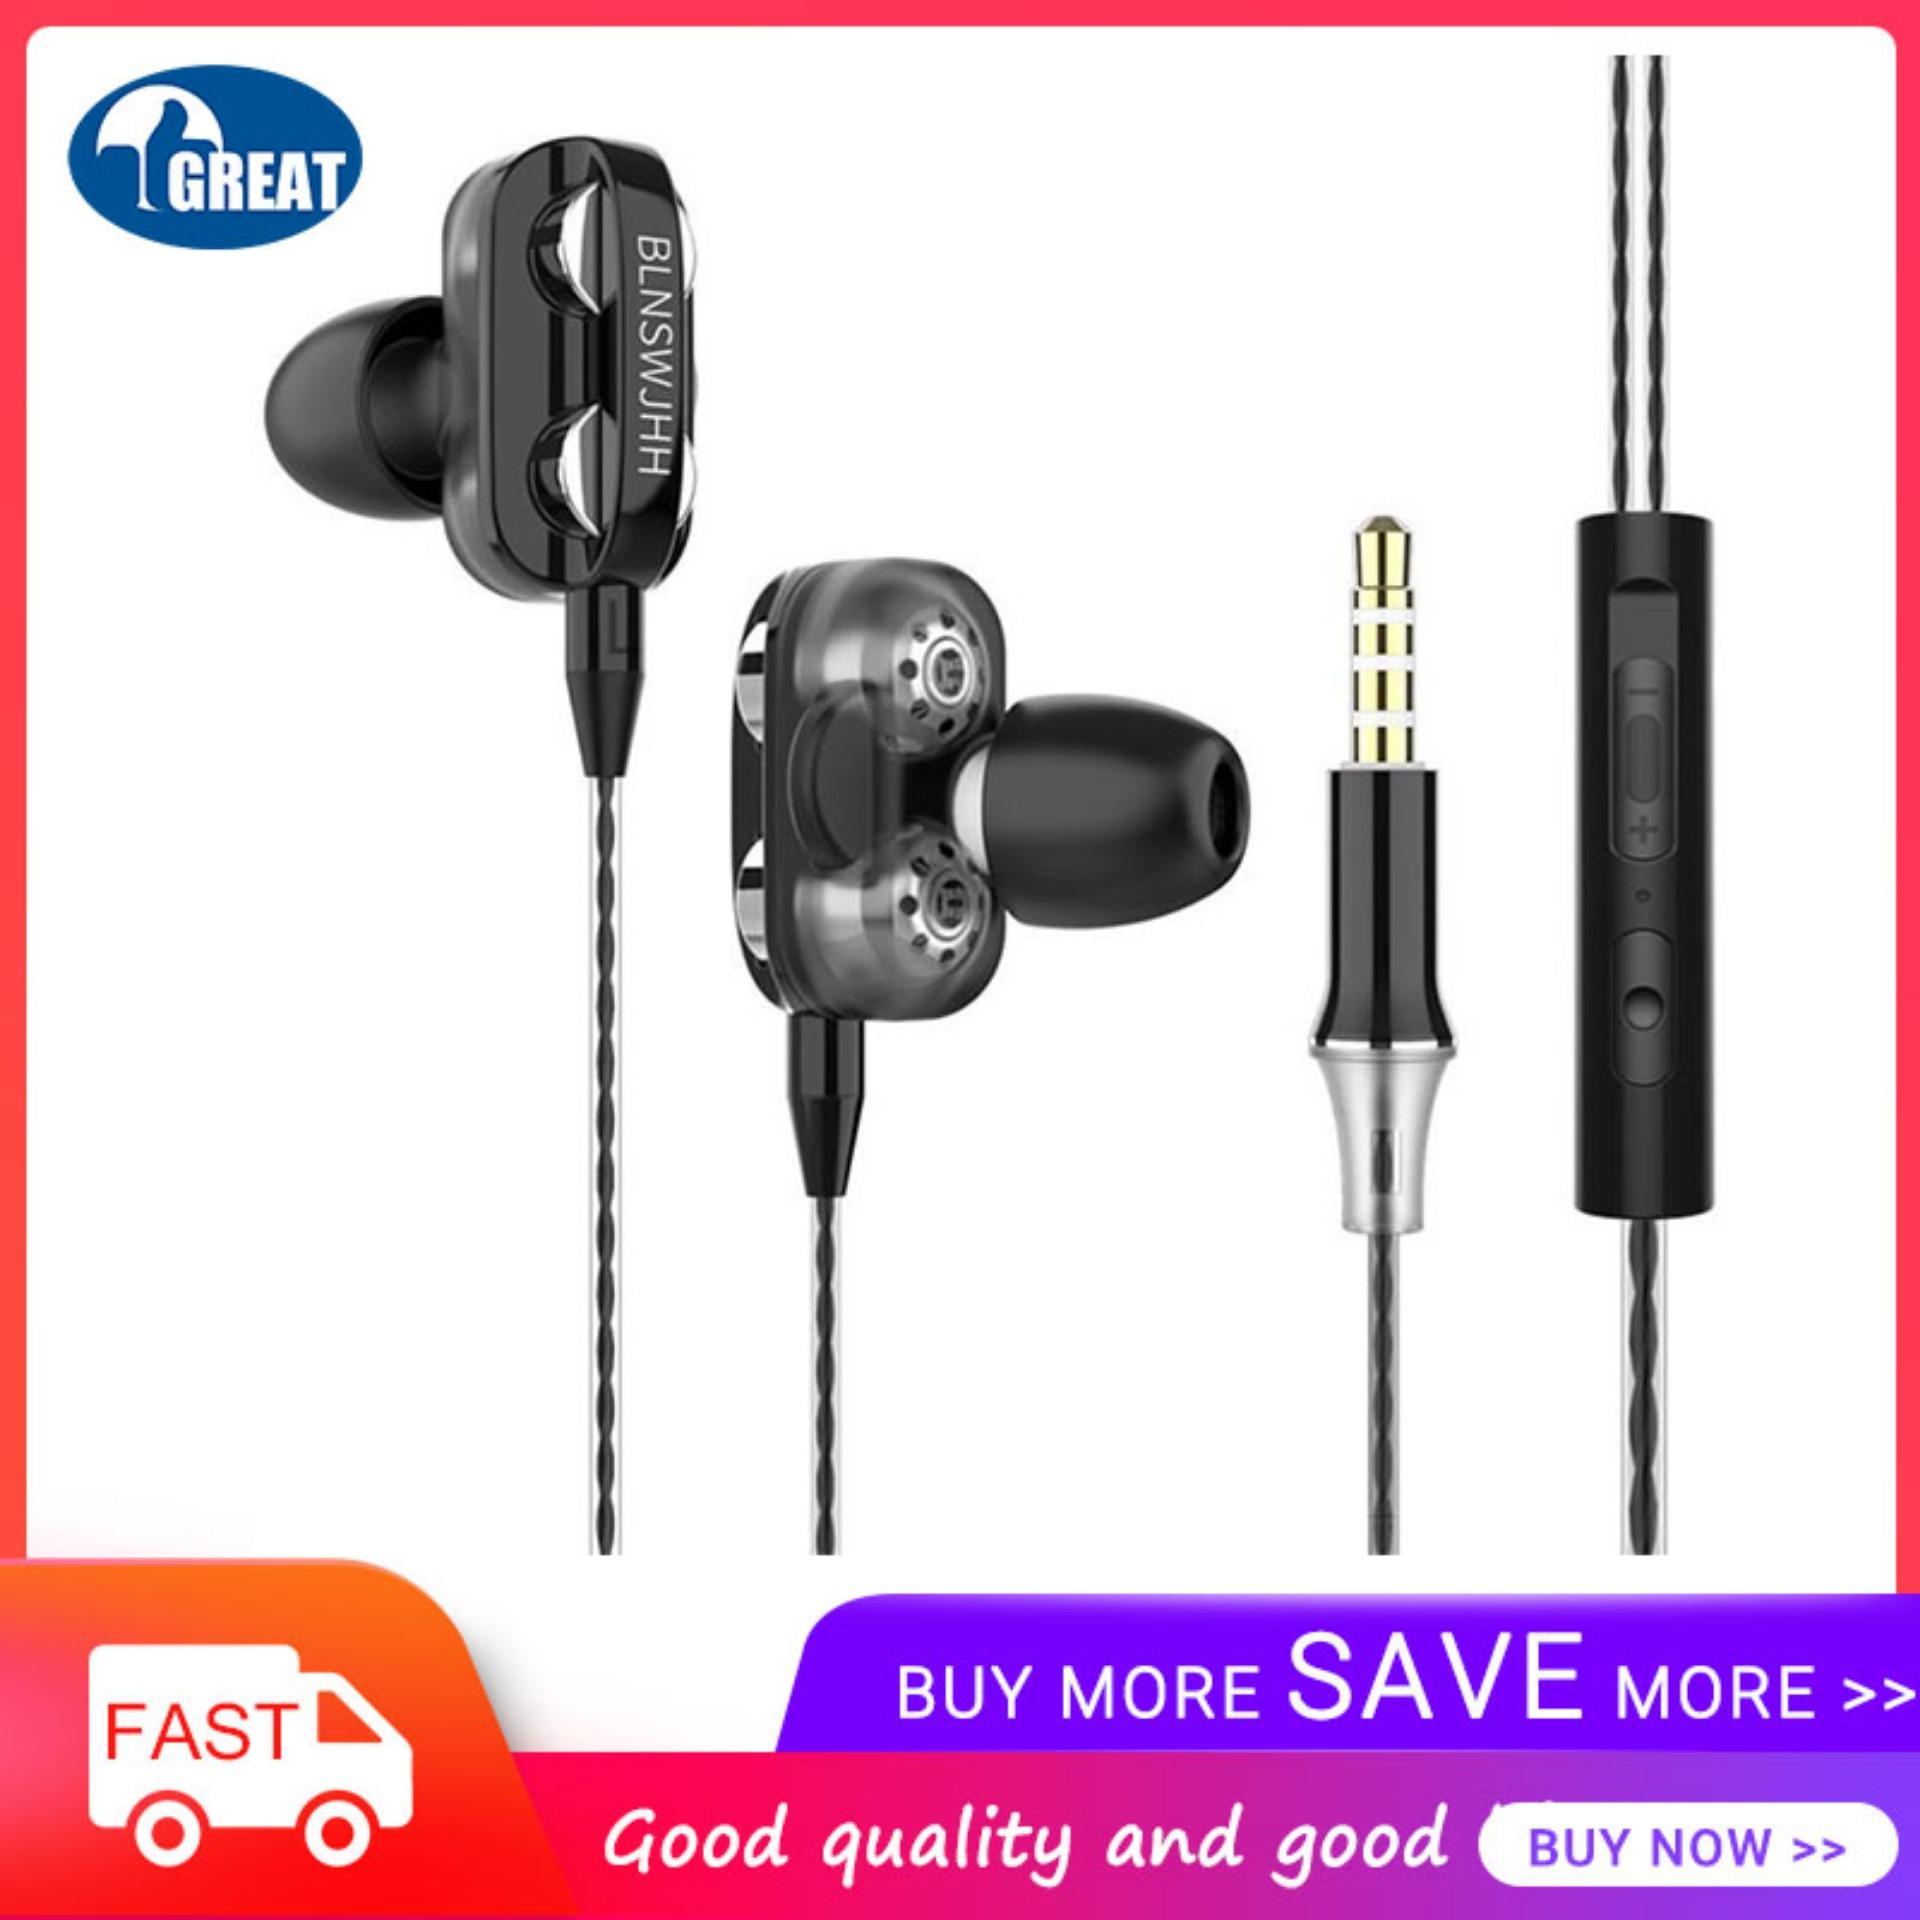 Goodgreat A4 In-Ear Earbud Headphone Ganda Dinamis Earphones Driver dengan MIC Bass Kuat dan